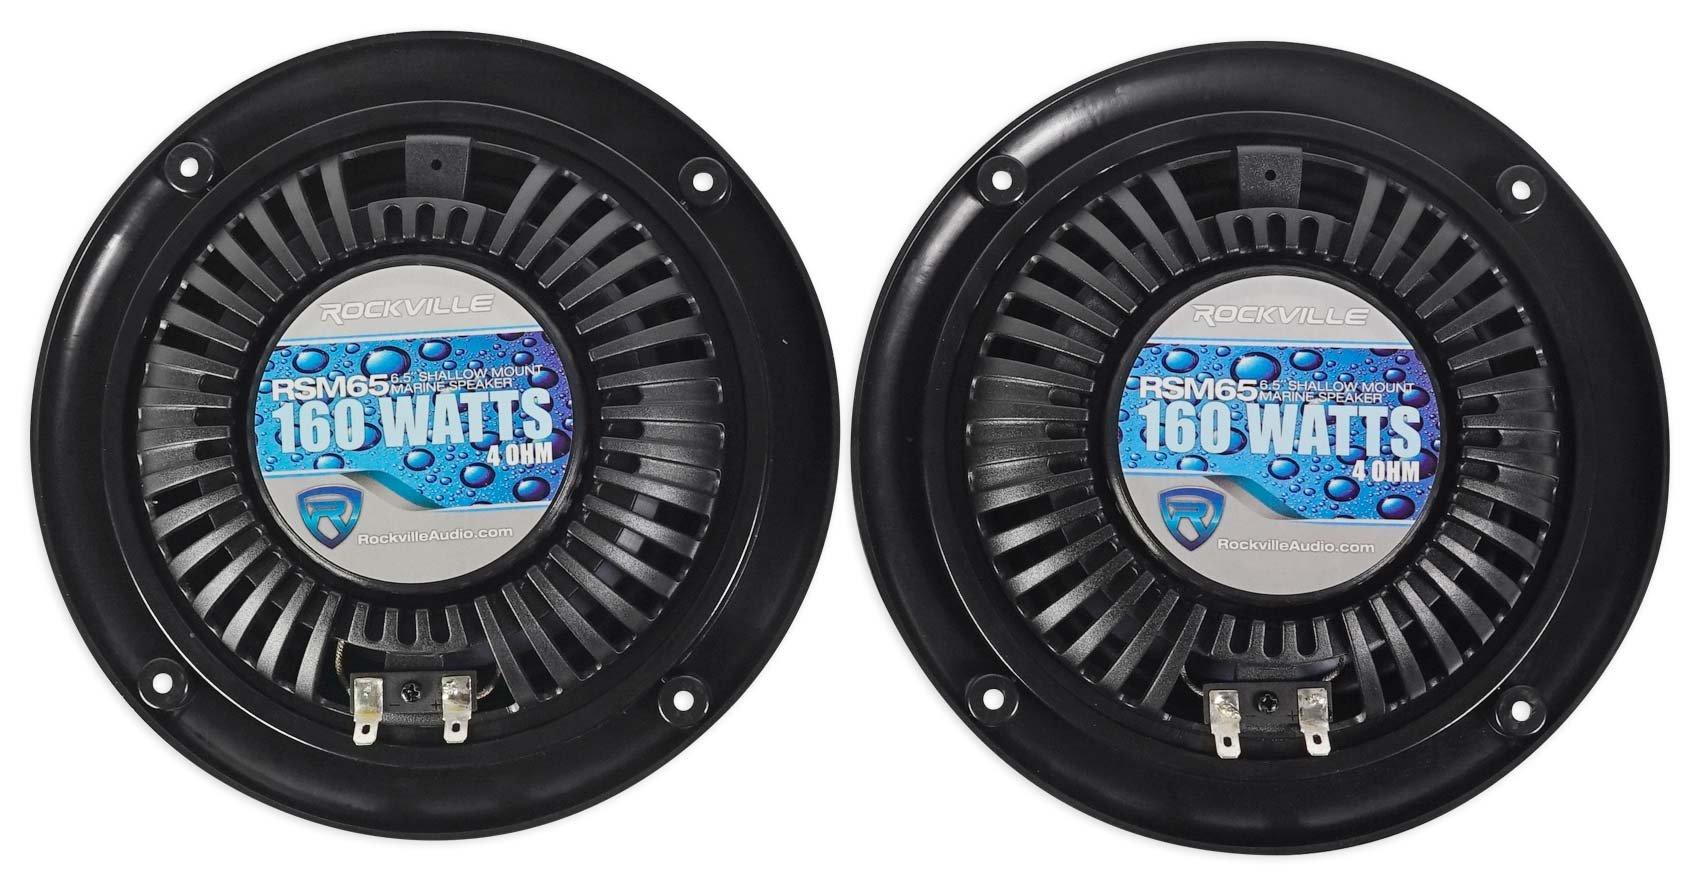 2 Rockville RSM65B 6.5'' 320w Waterproof Shallow Slim Speakers 4 RZR/ATV/UTV/Cart by Rockville (Image #5)